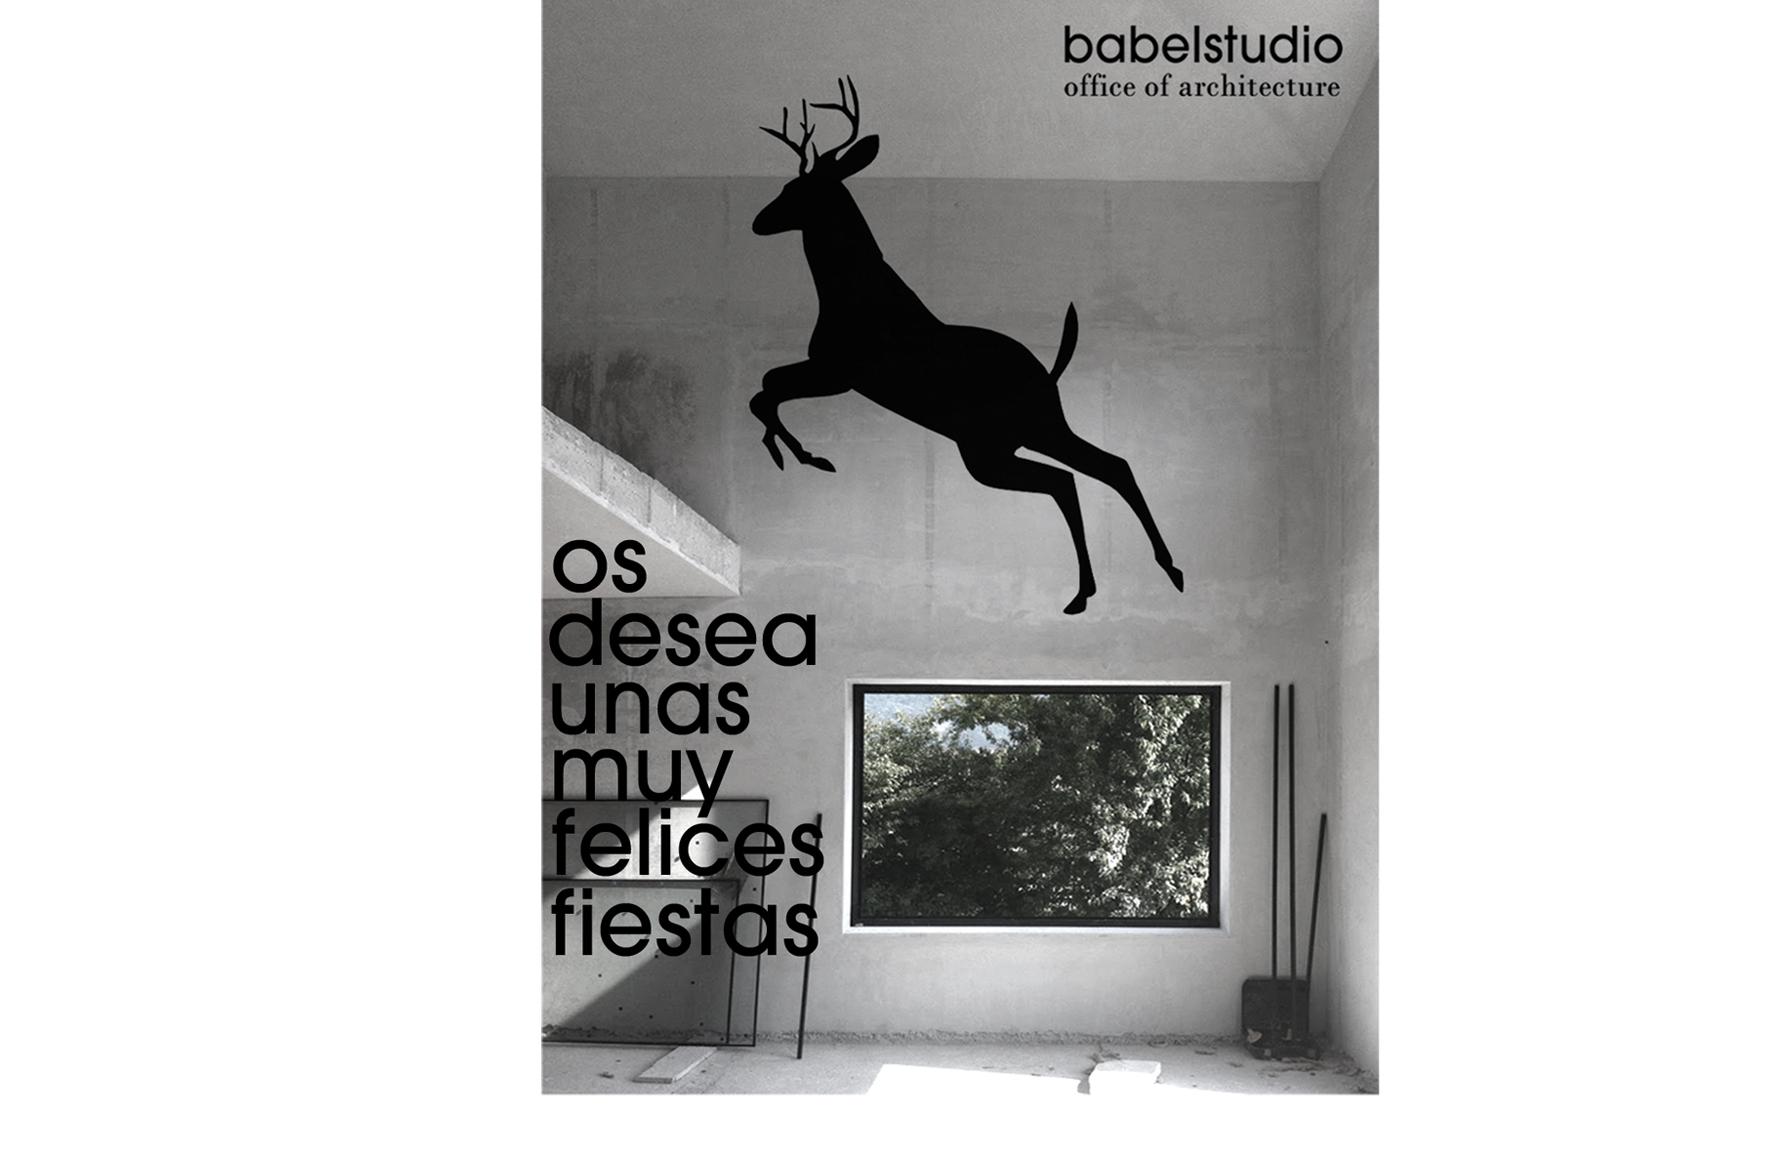 BABELstudio-New Year-2014-Image 01.jpg